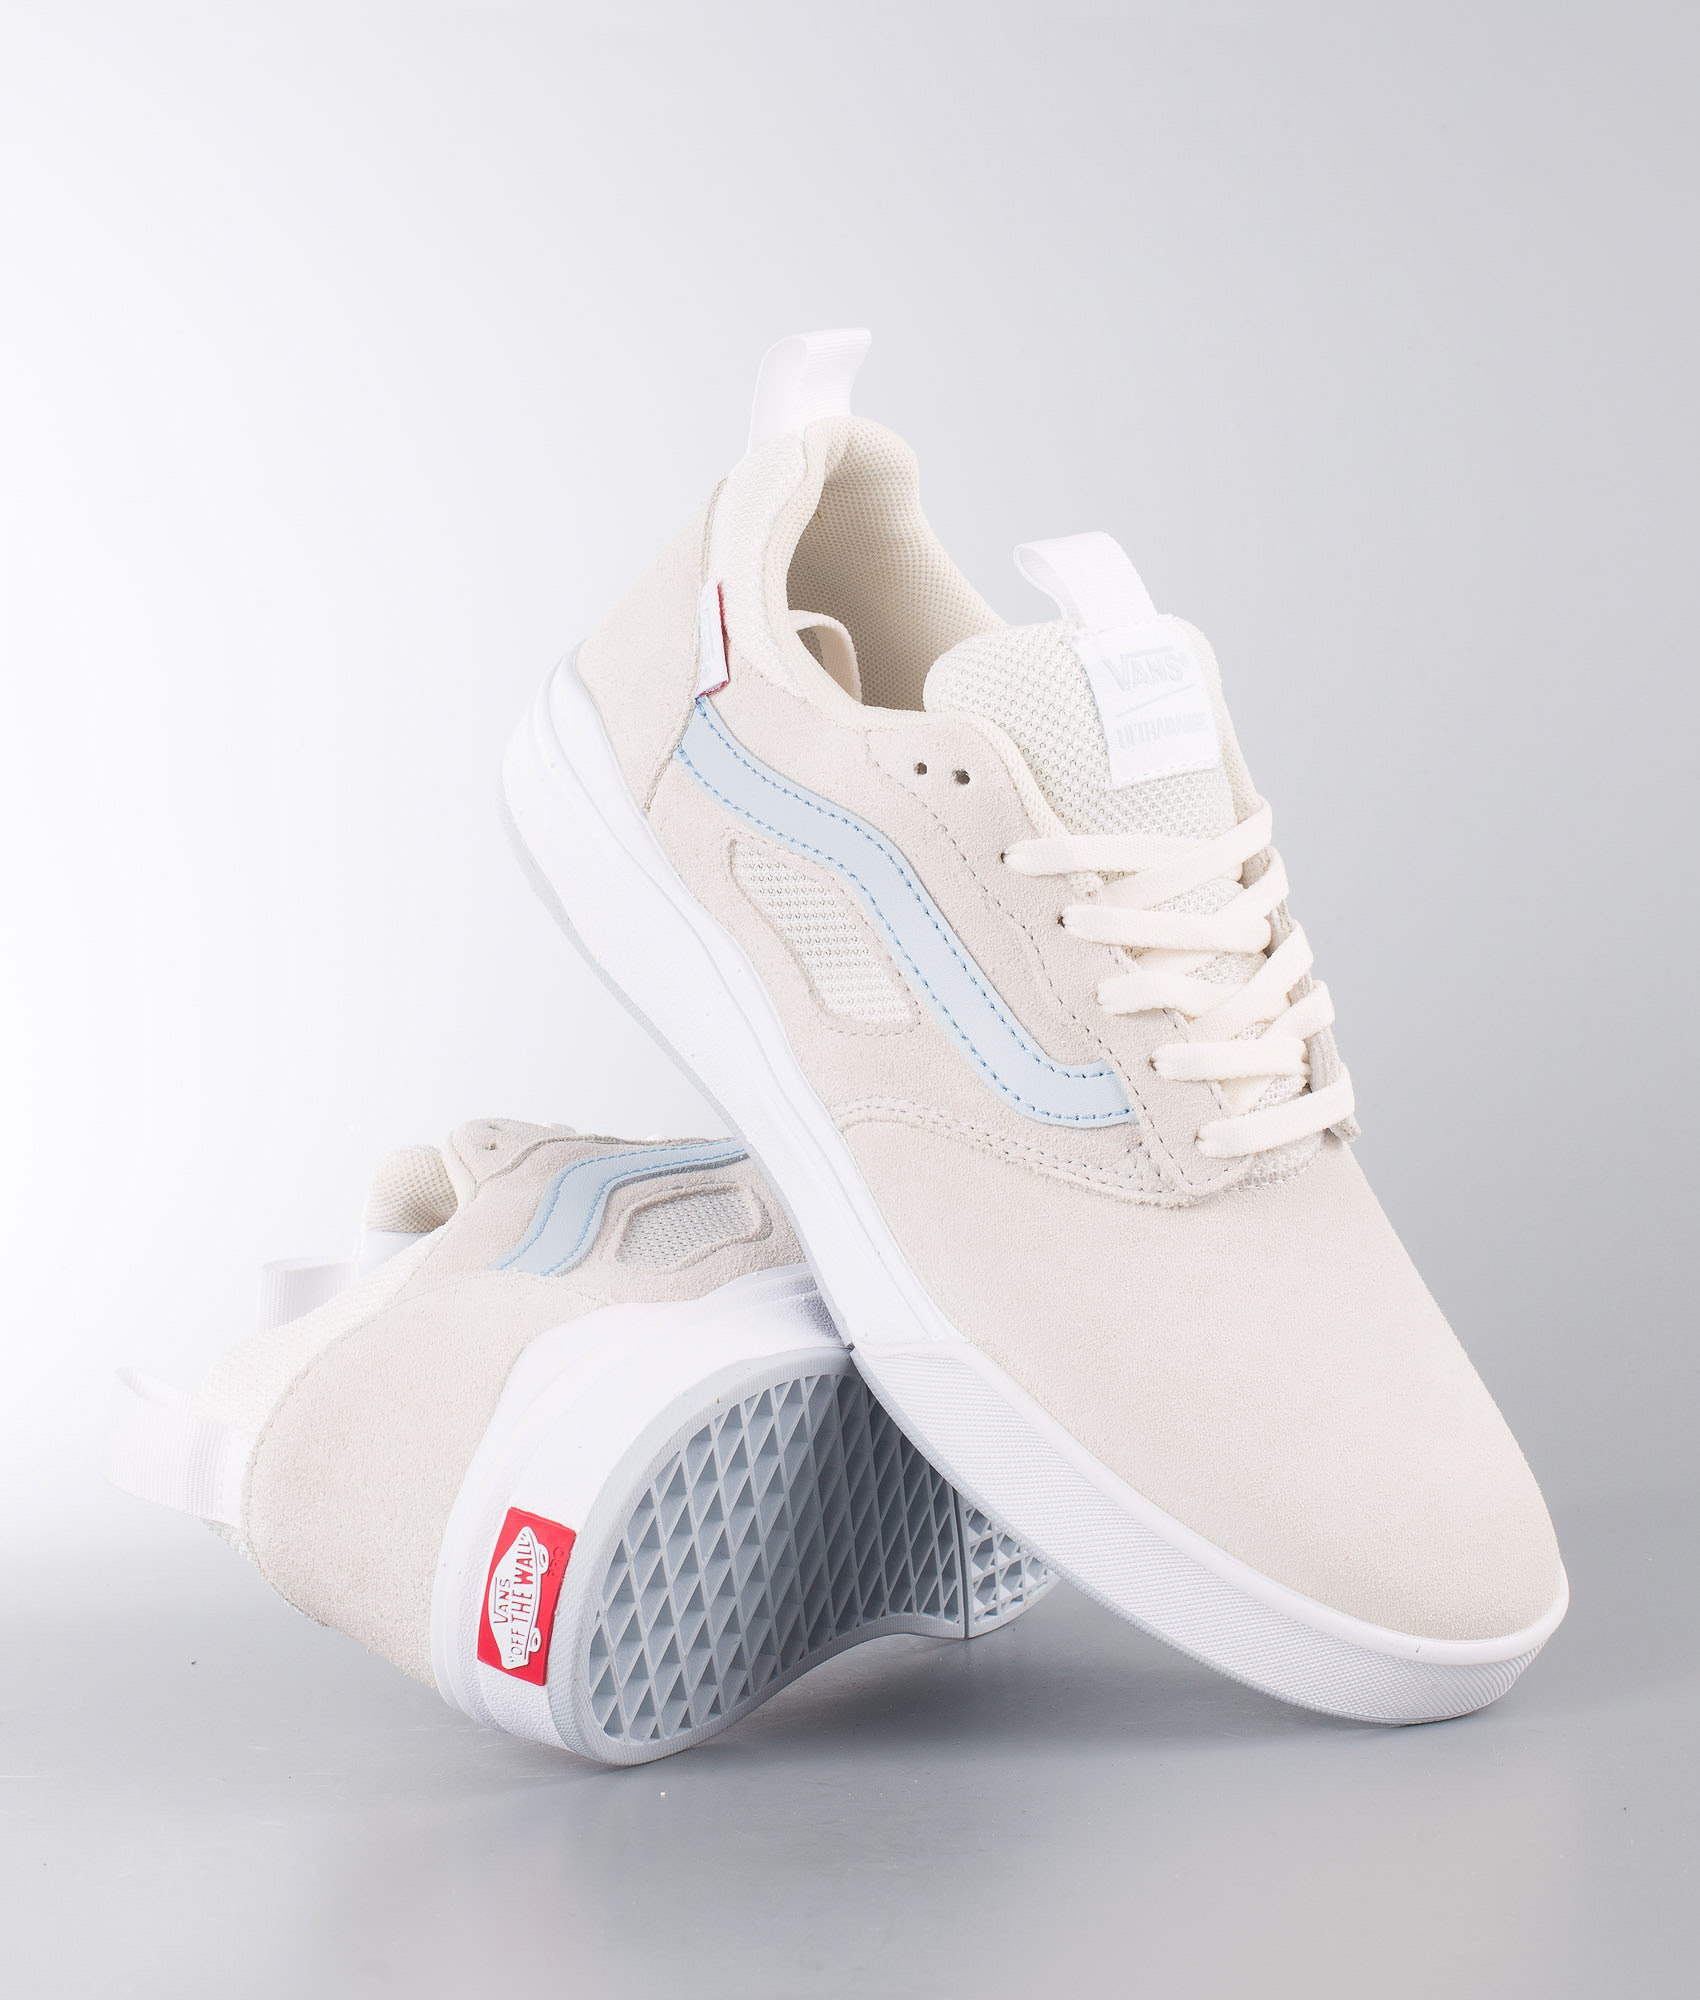 07f213fb6e Vans Ultrarange Pro Shoes White. (Center Court) Classic White Baby Blue